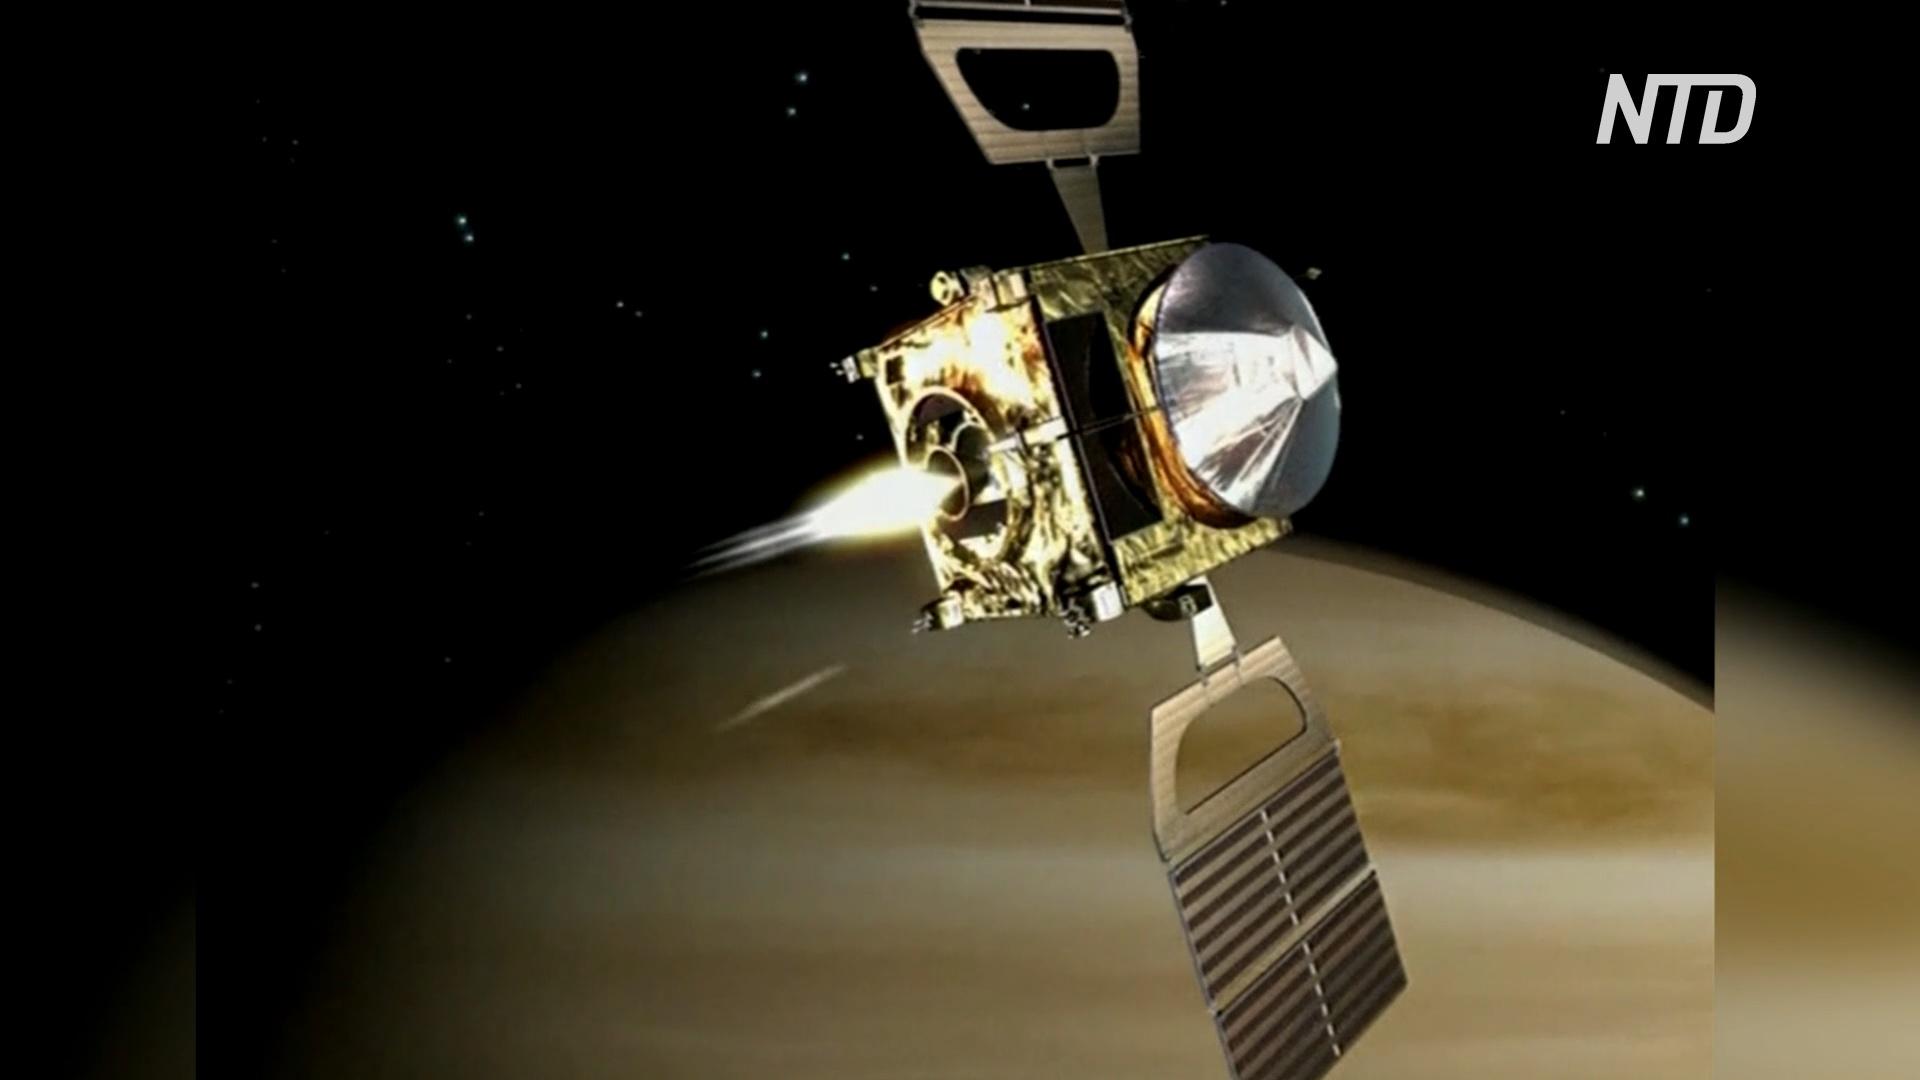 НАСА готовит две миссии на Венеру